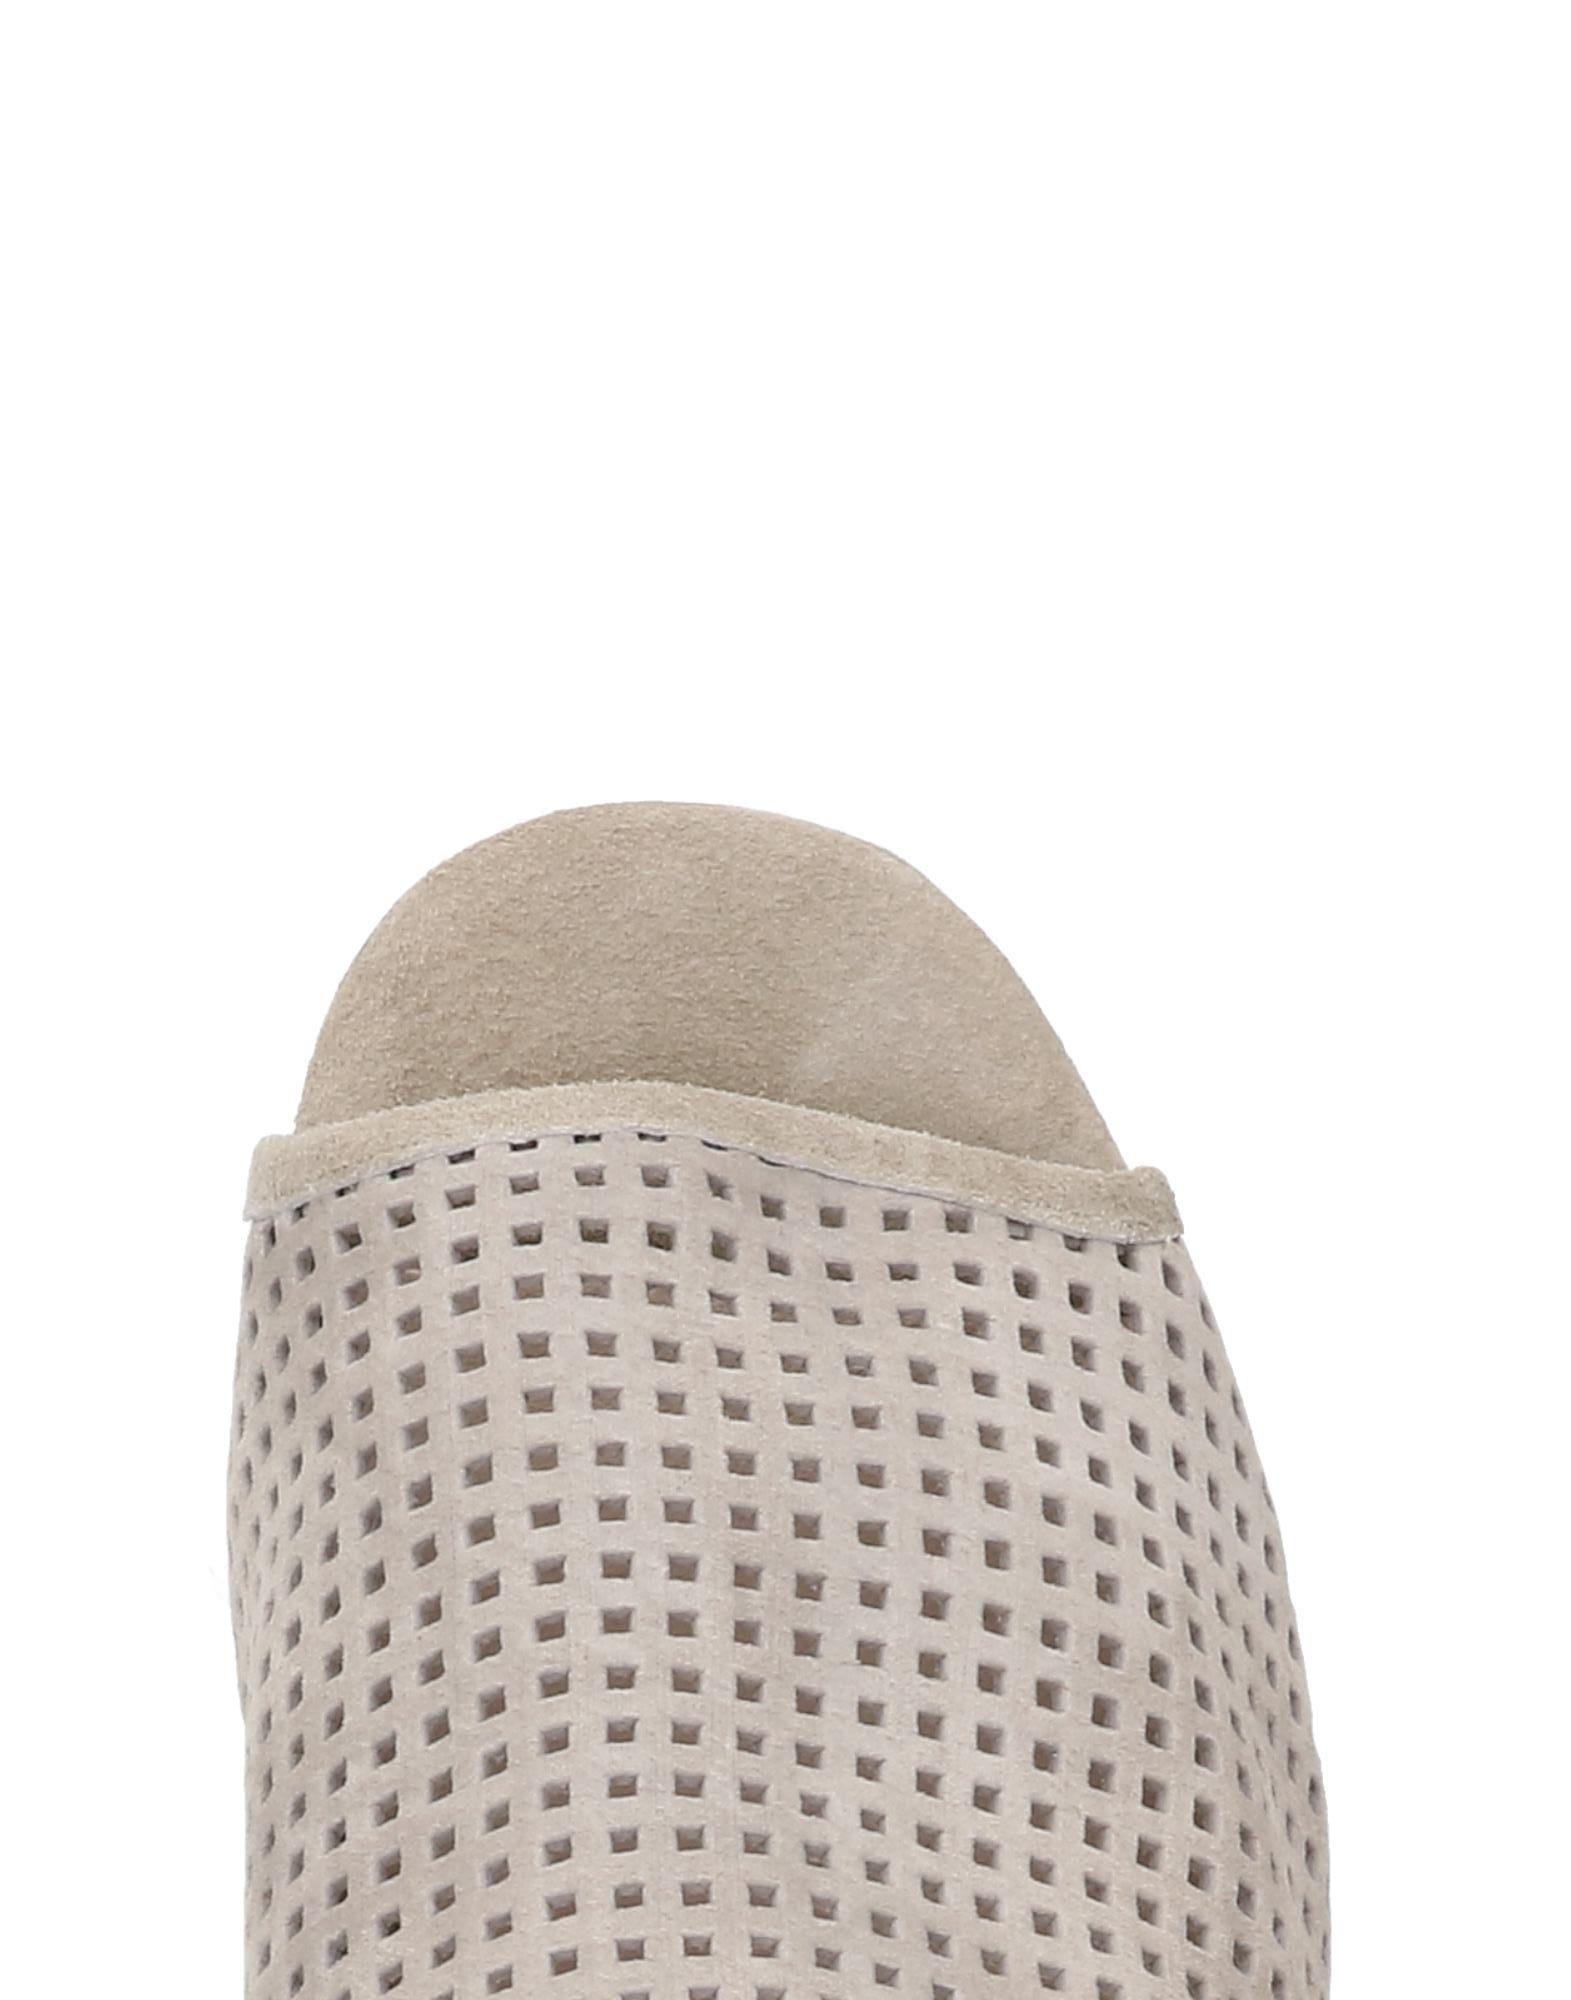 Sacha London Sandalen Damen beliebte  11429175AB Gute Qualität beliebte Damen Schuhe 755f05